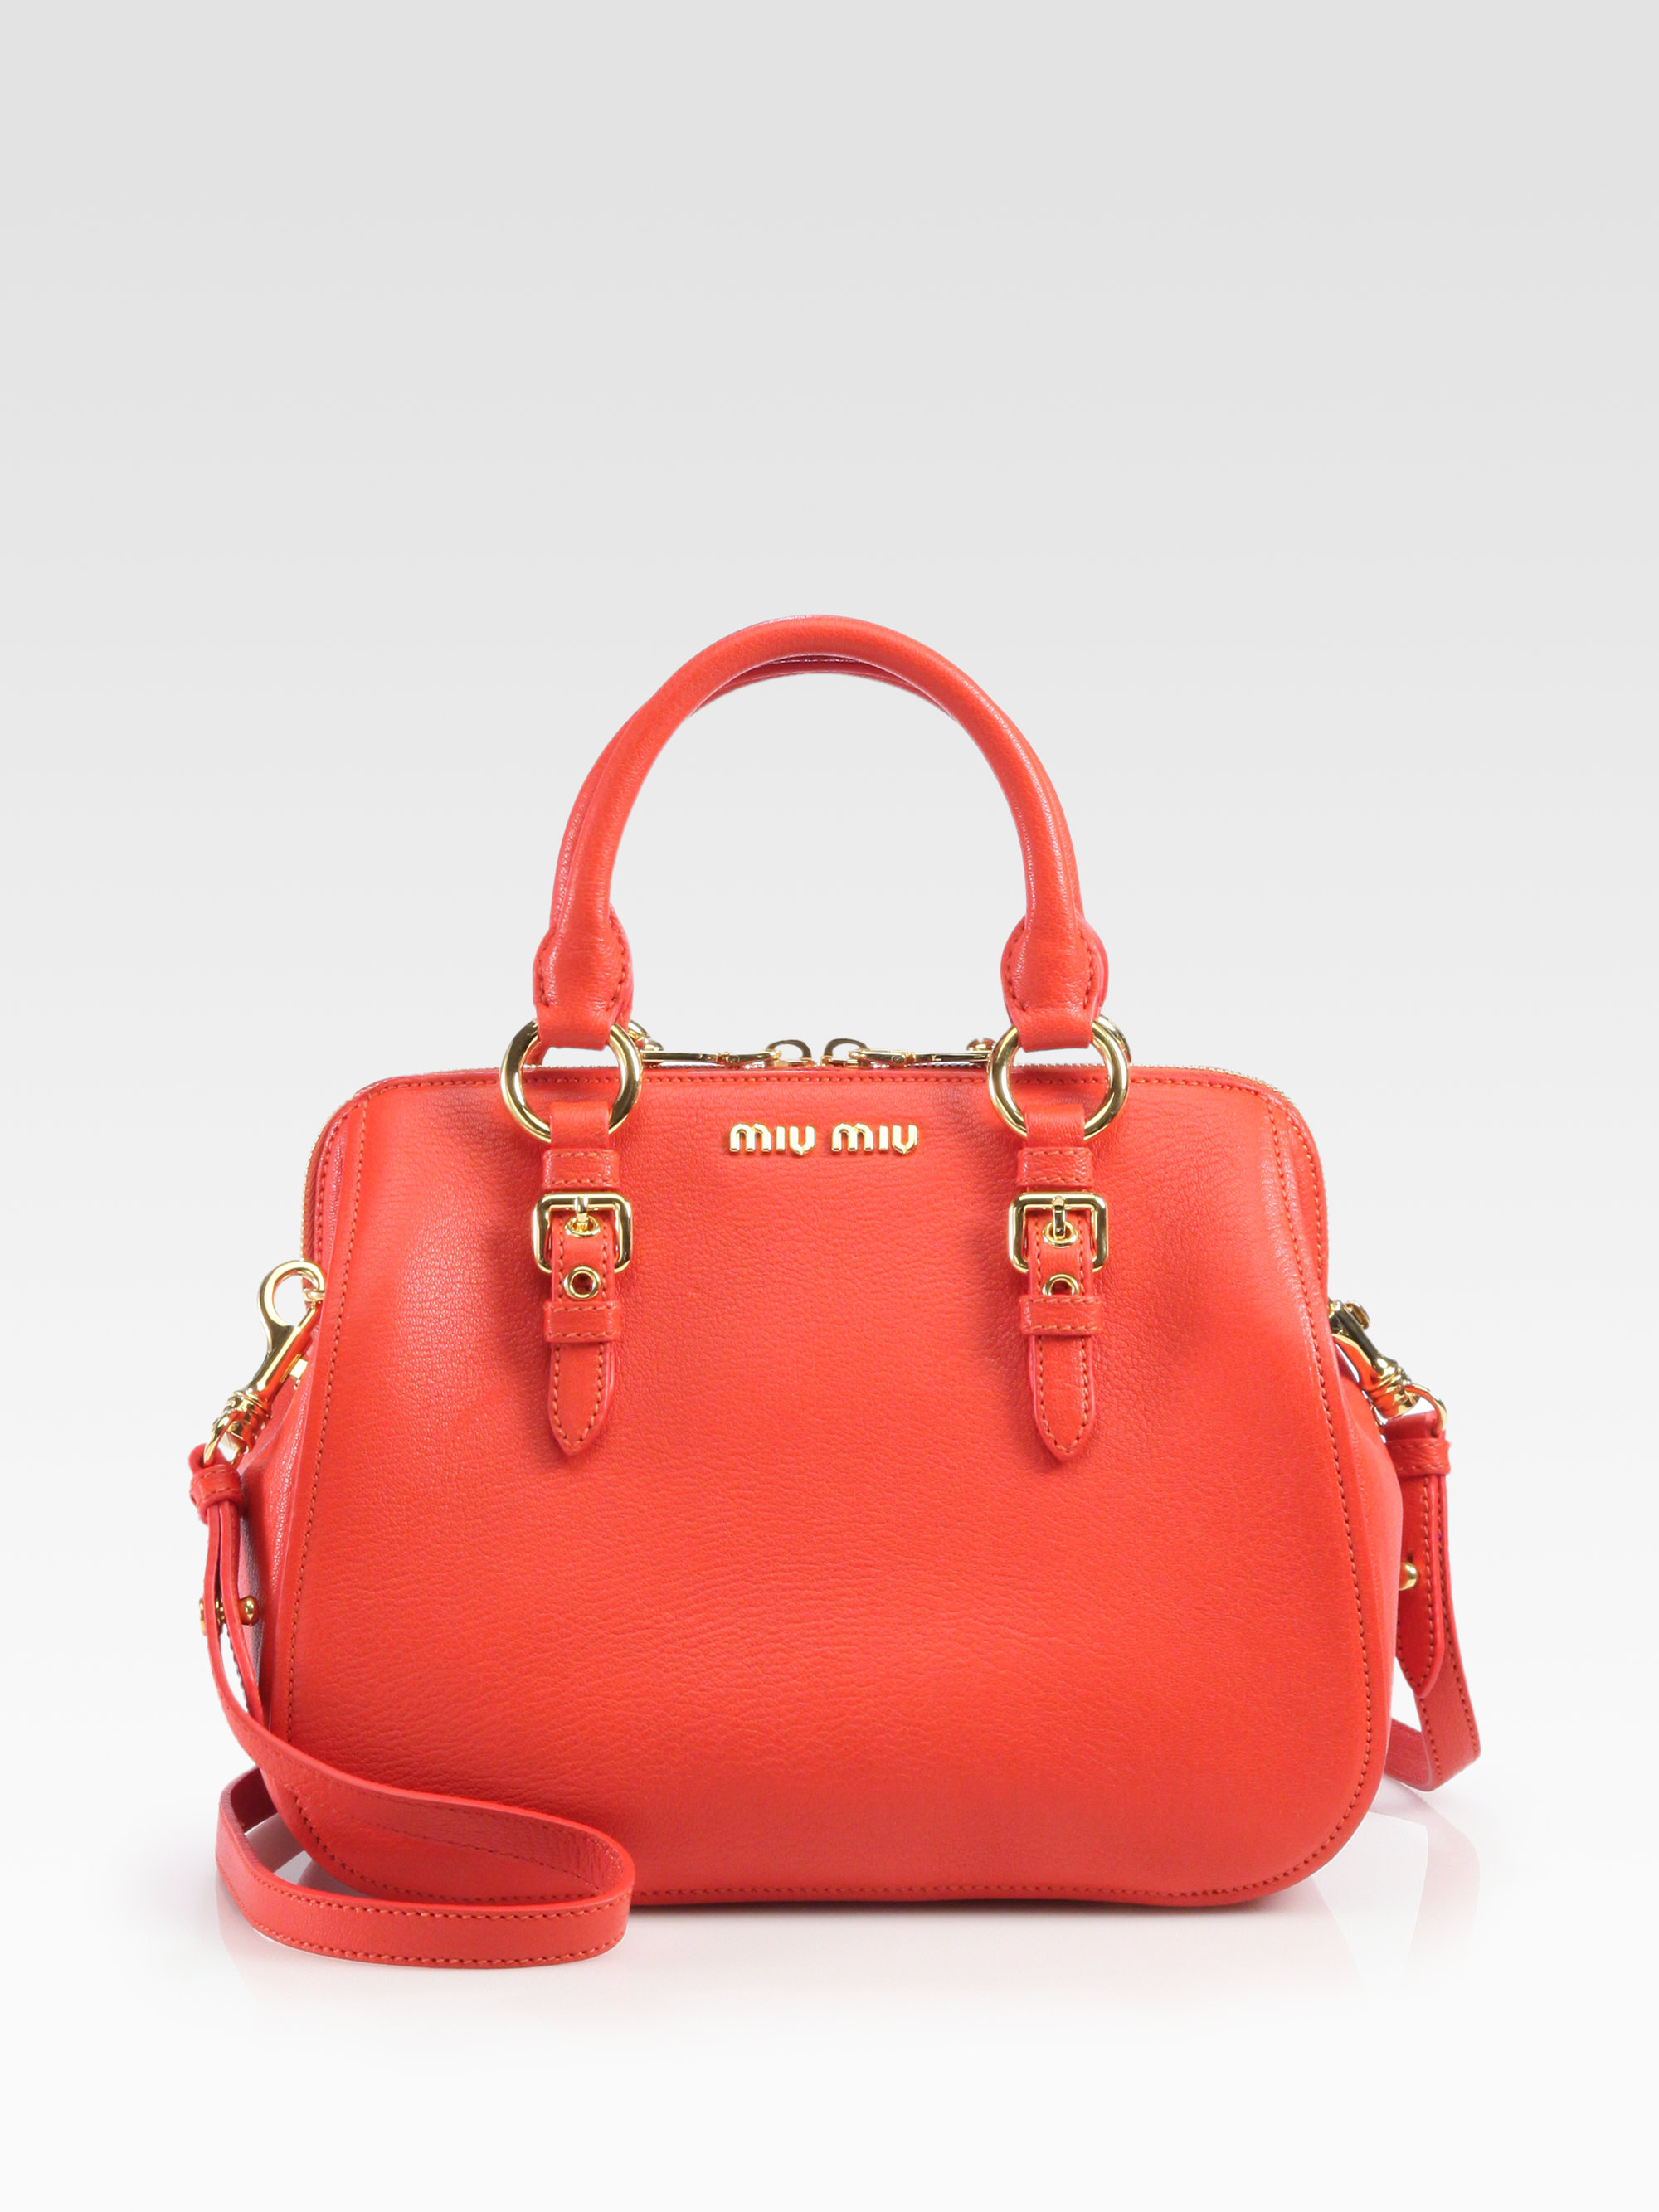 Miu Miu Small Red Bag